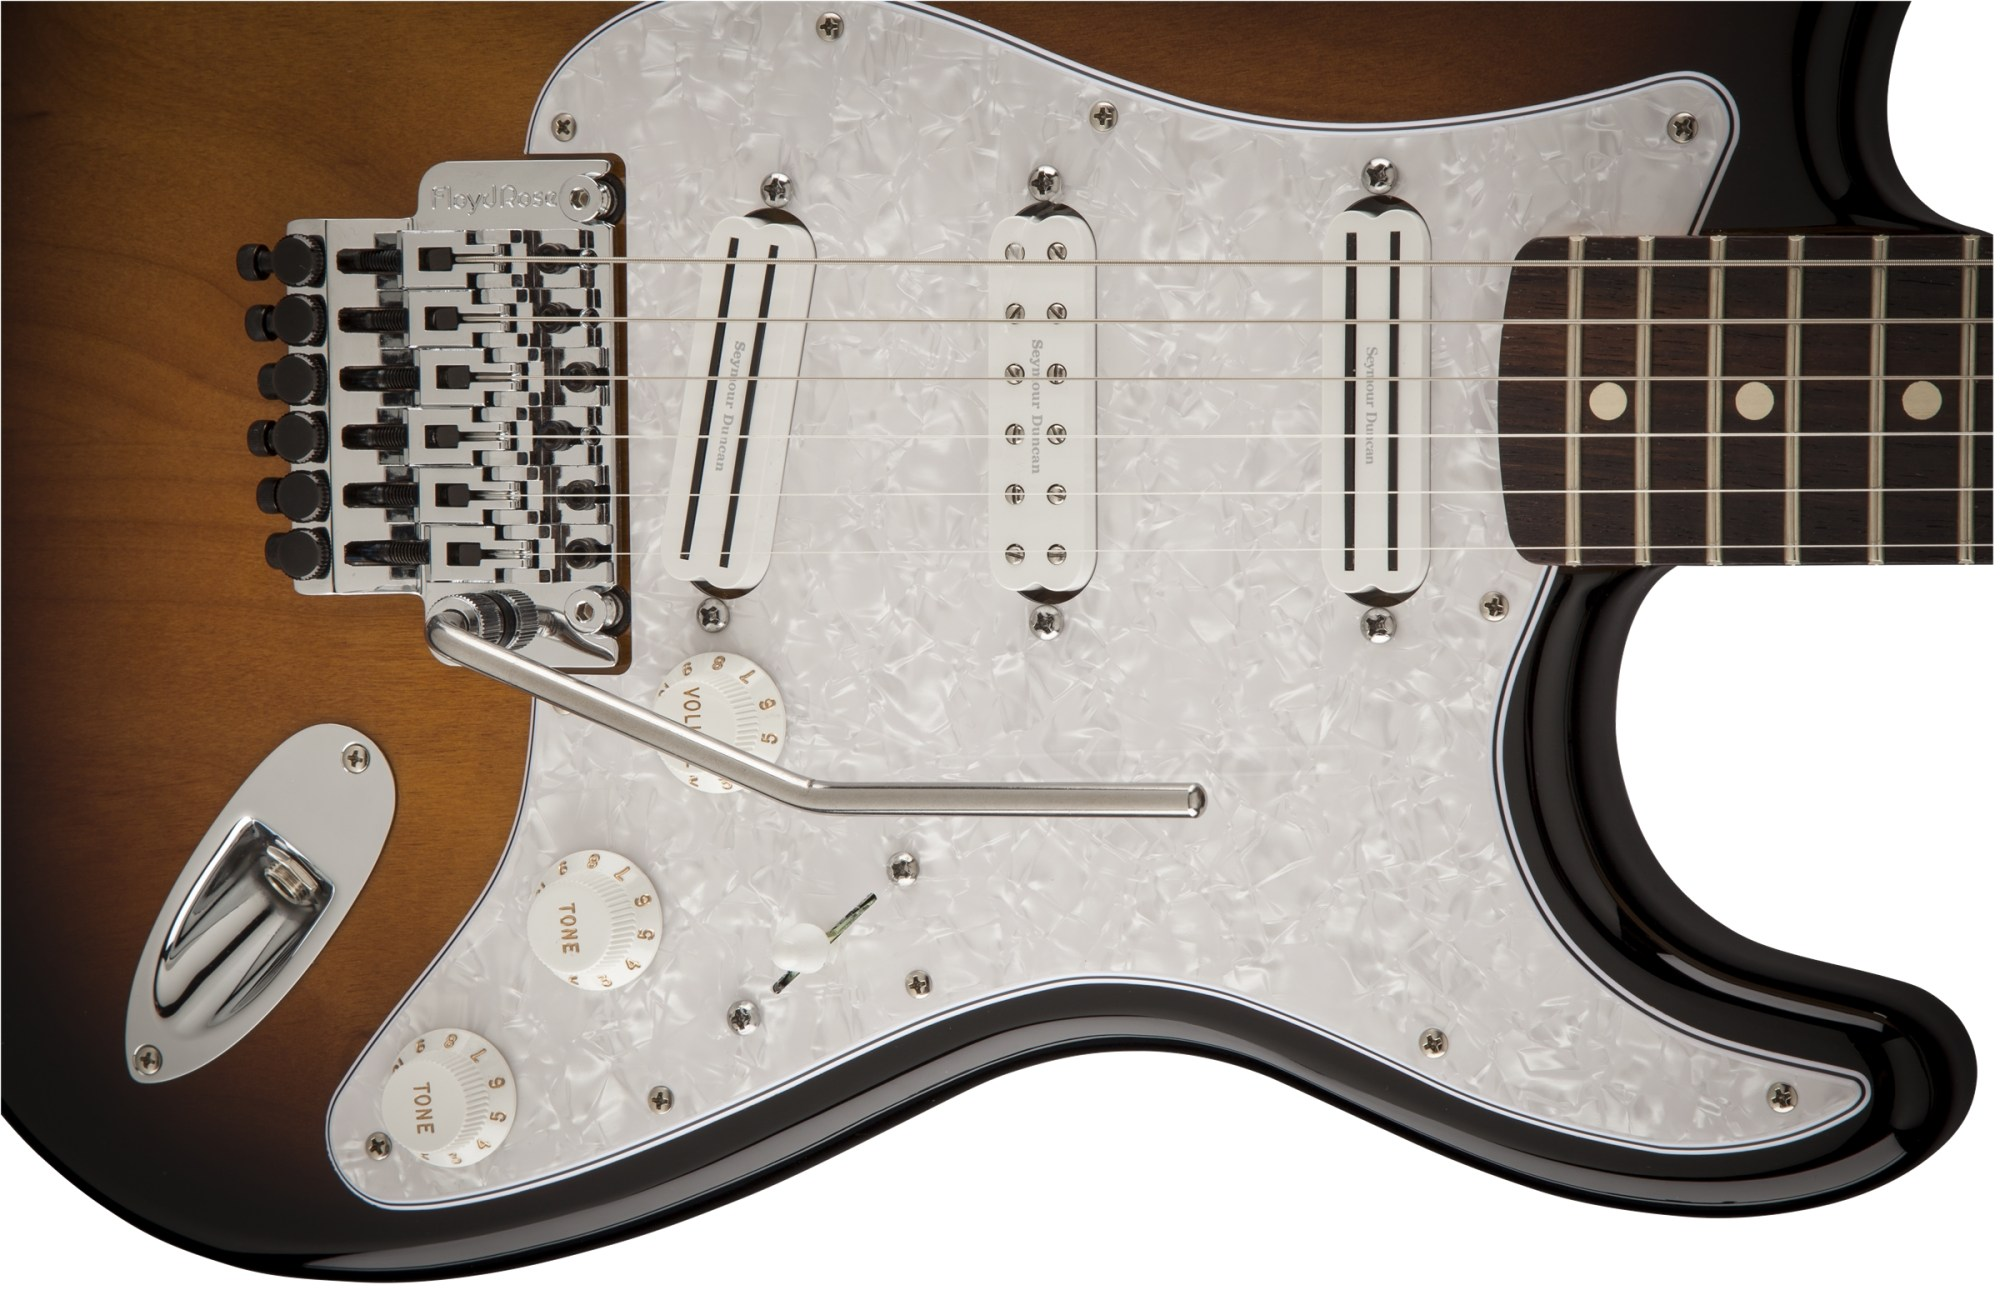 hight resolution of dave murray stratocaster acirc reg fender electric guitars dave murray stratocasteracircreg humbucker diagram